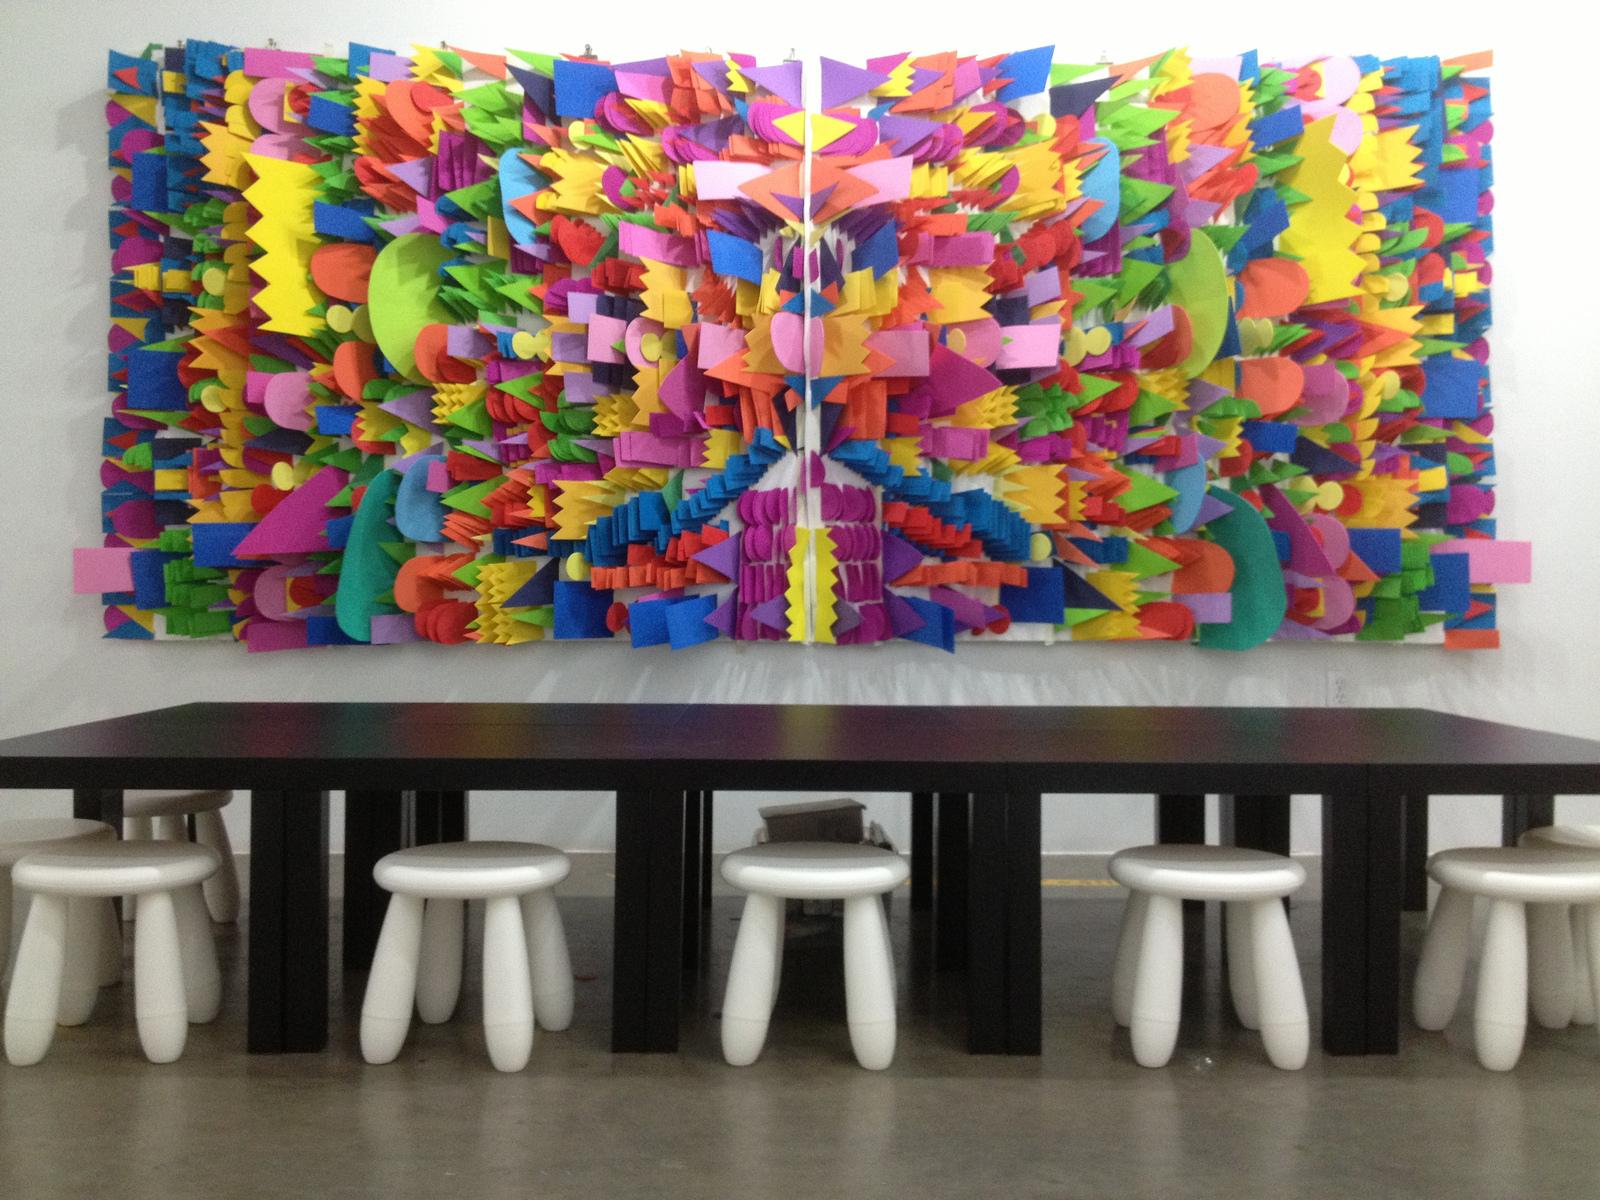 Stephanie Toppin - Foam Installation 1 (Pop Shop 2013)